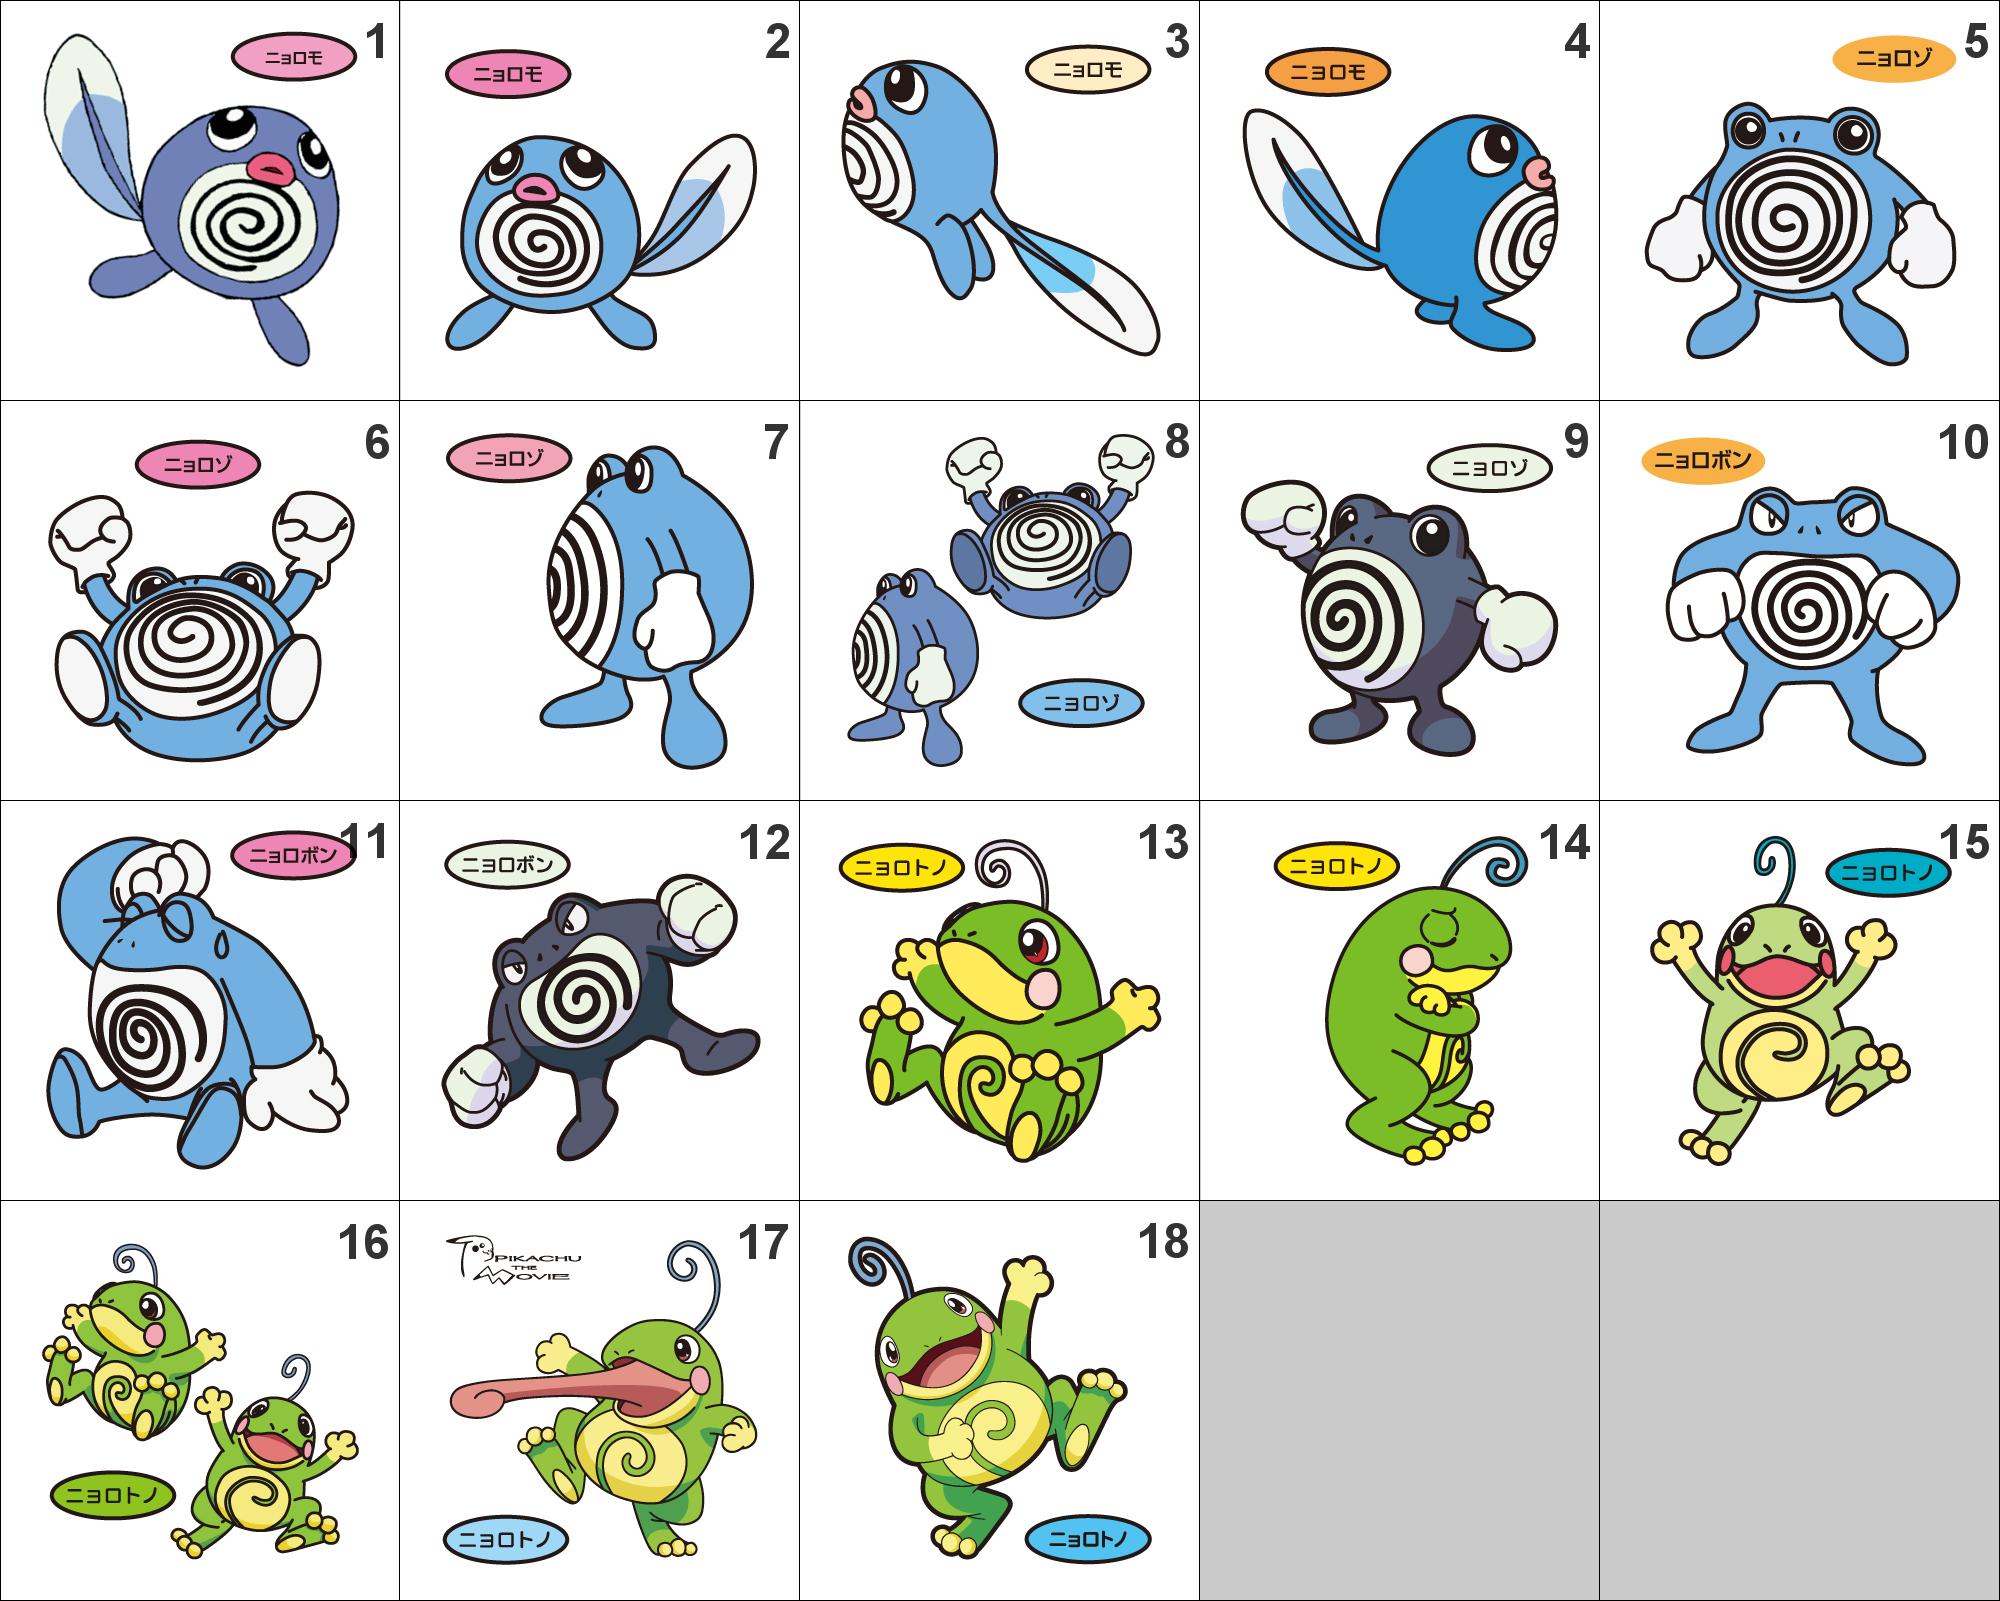 poliwag images pokemon images